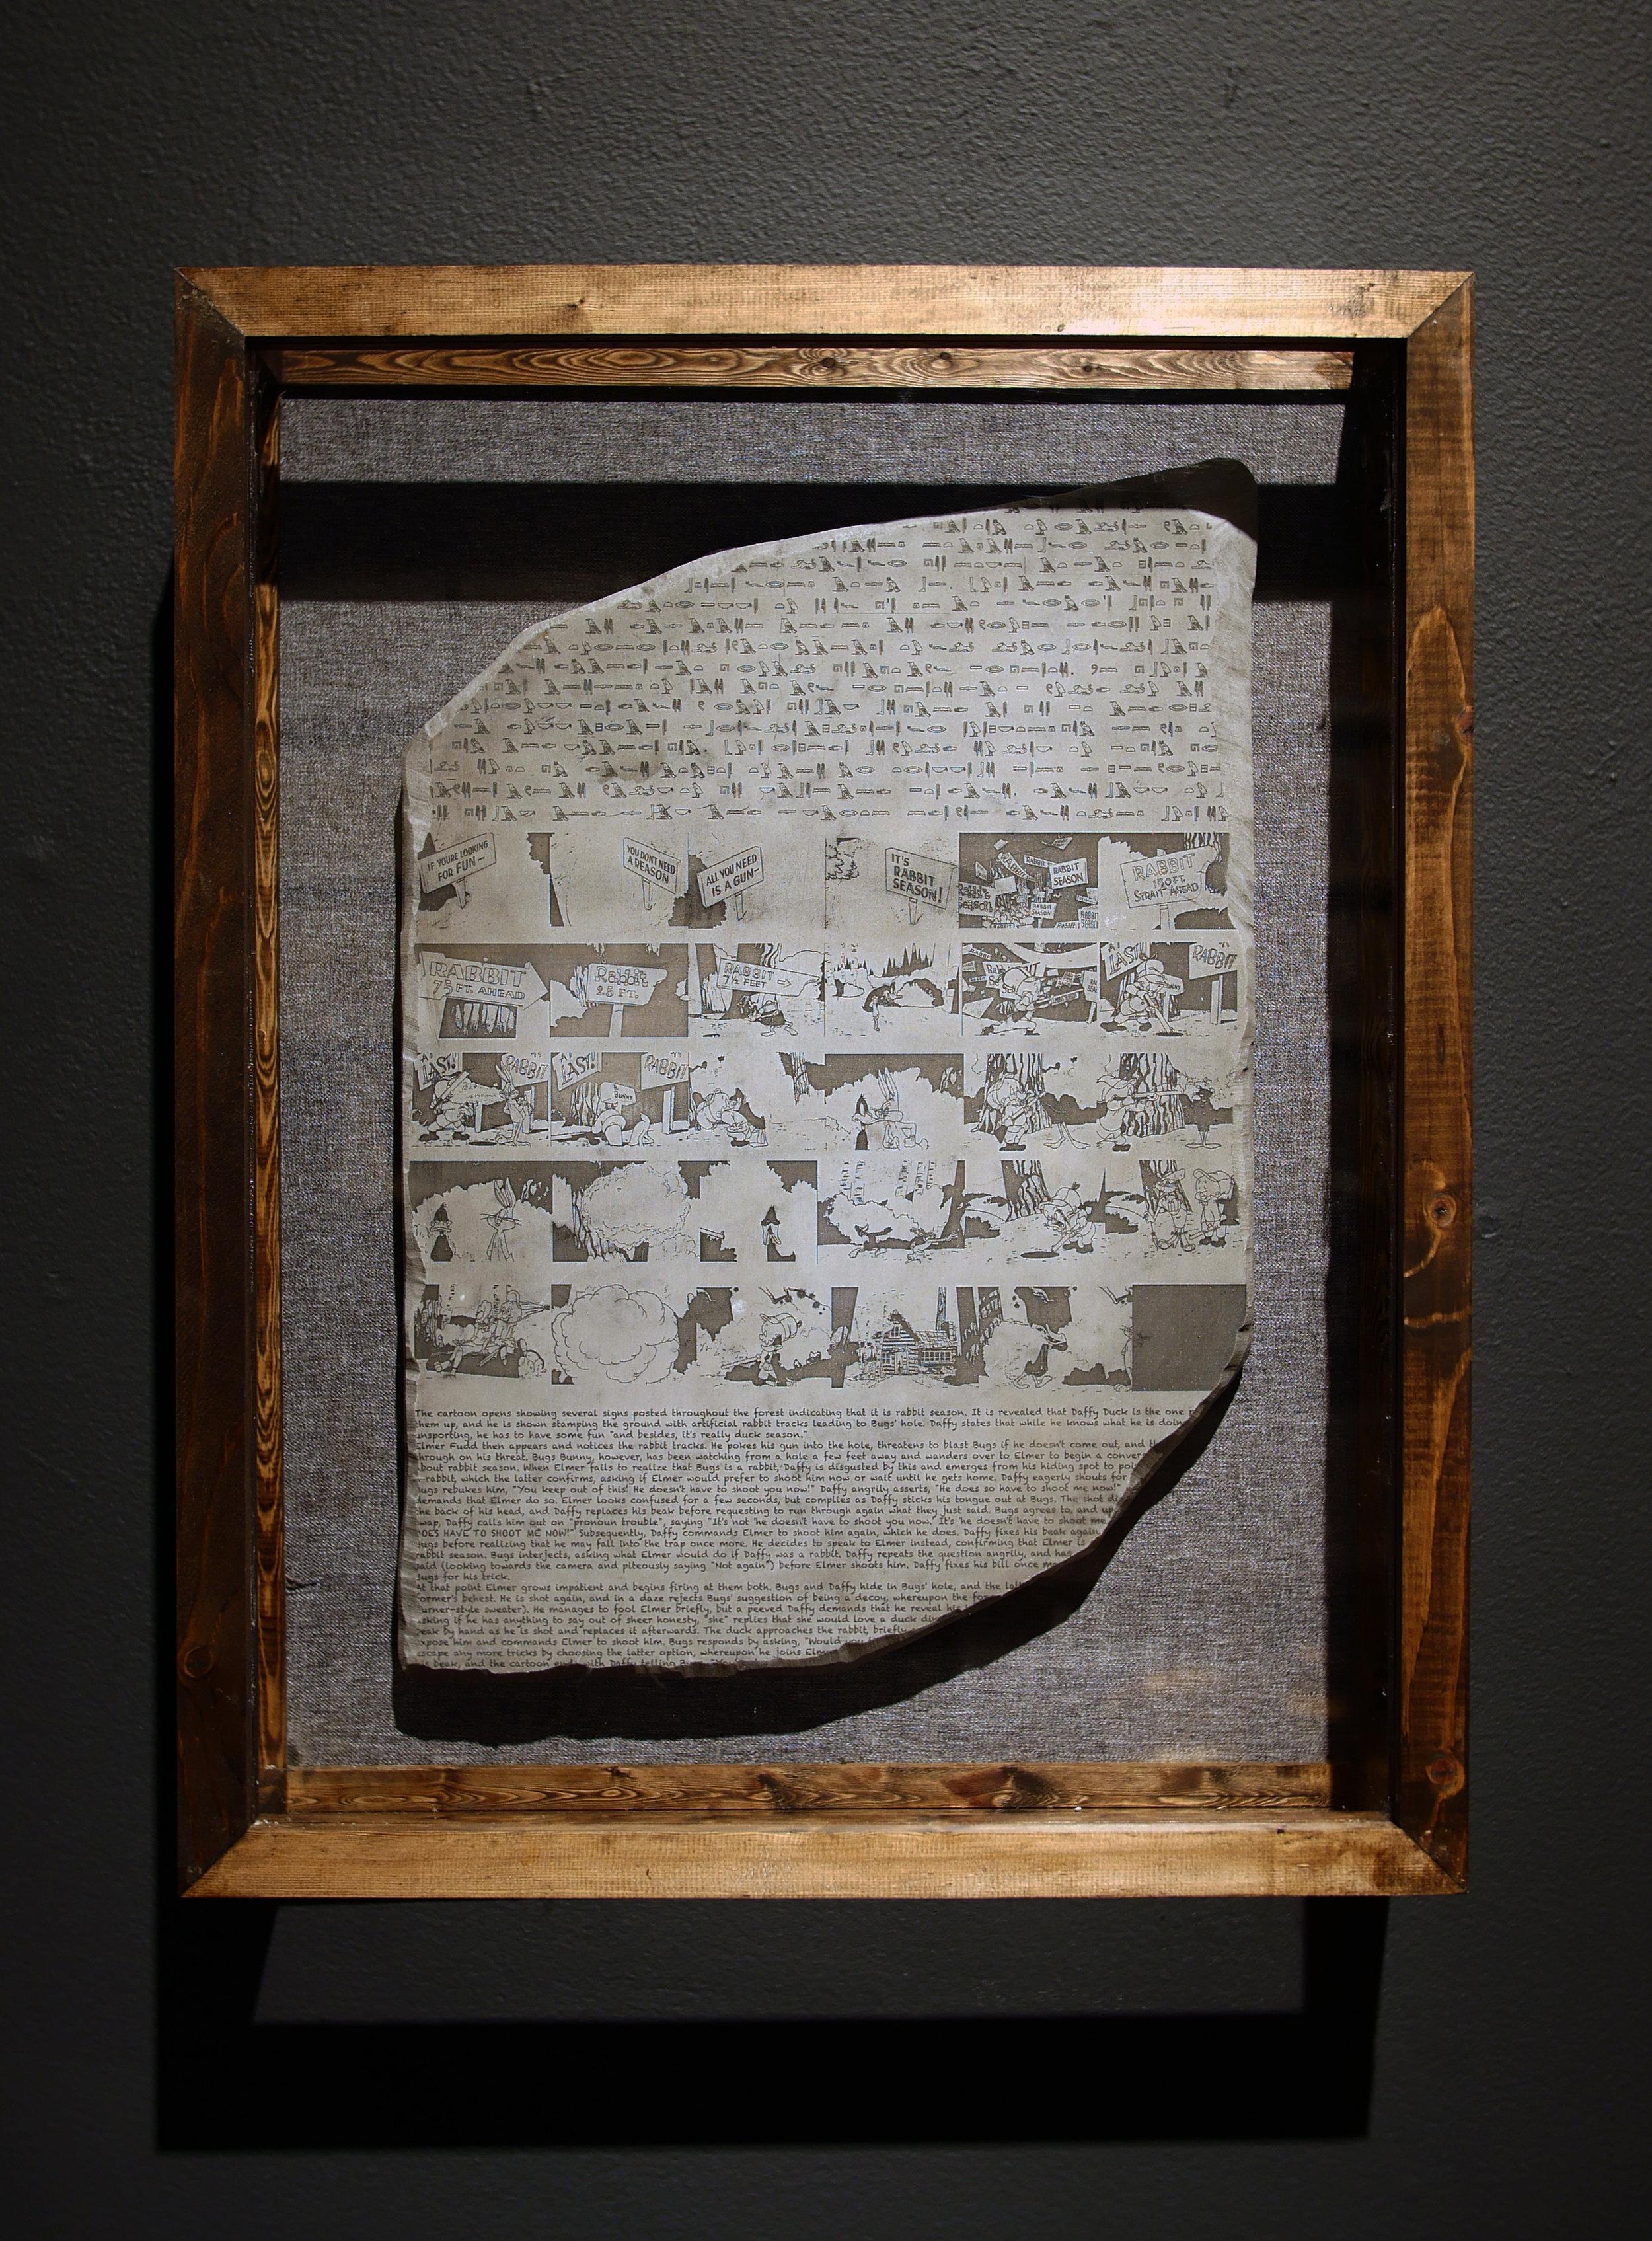 Rosetta Stone, 2019